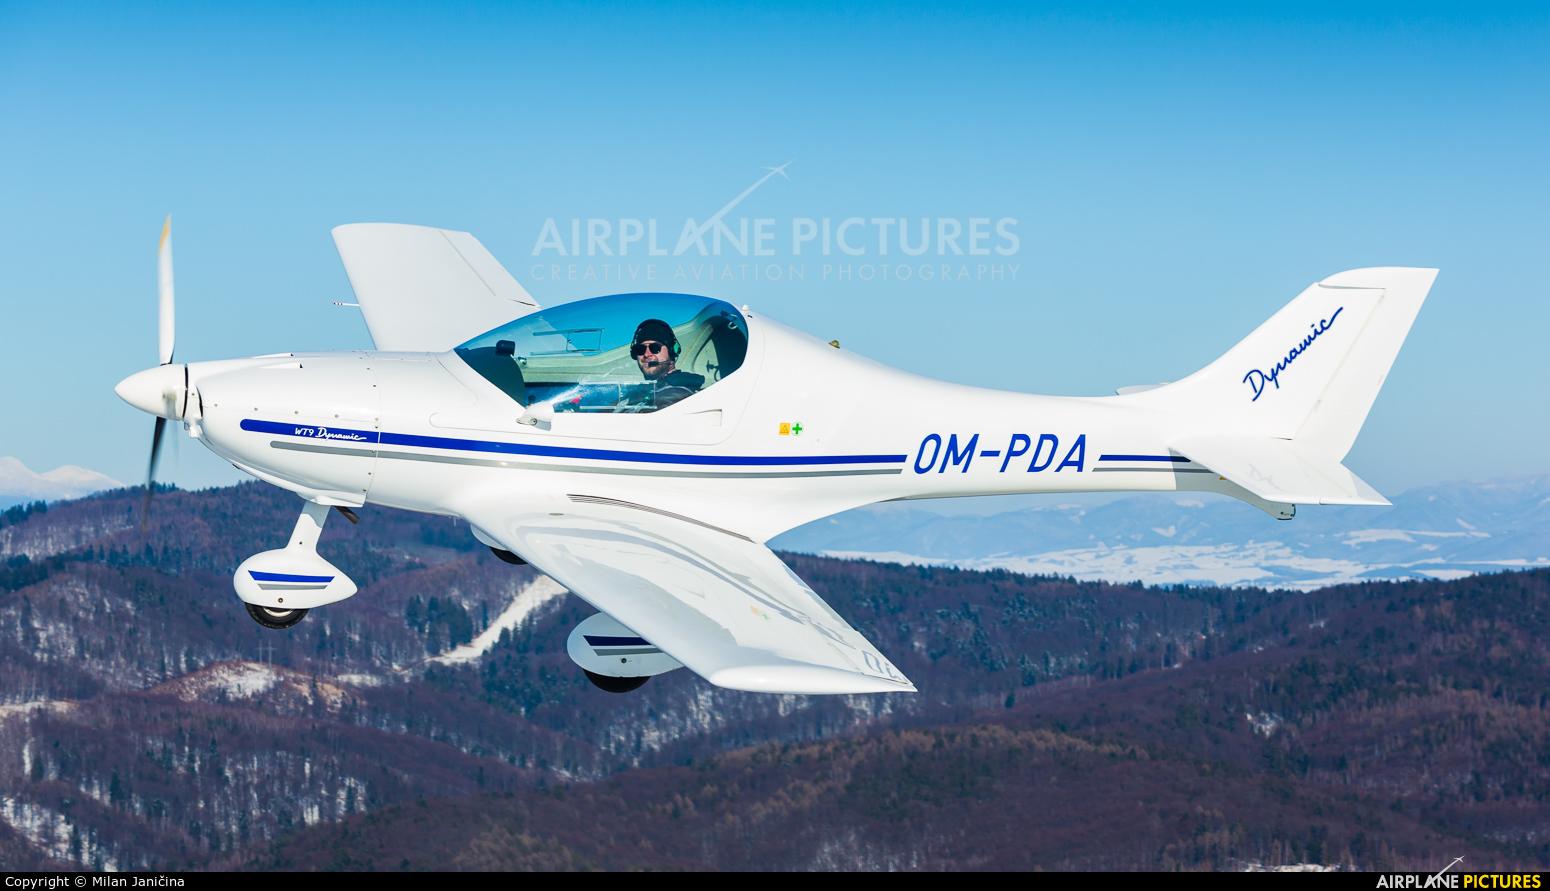 Aeroklub Prievidza OM-PDA aircraft at In Flight - Slovakia